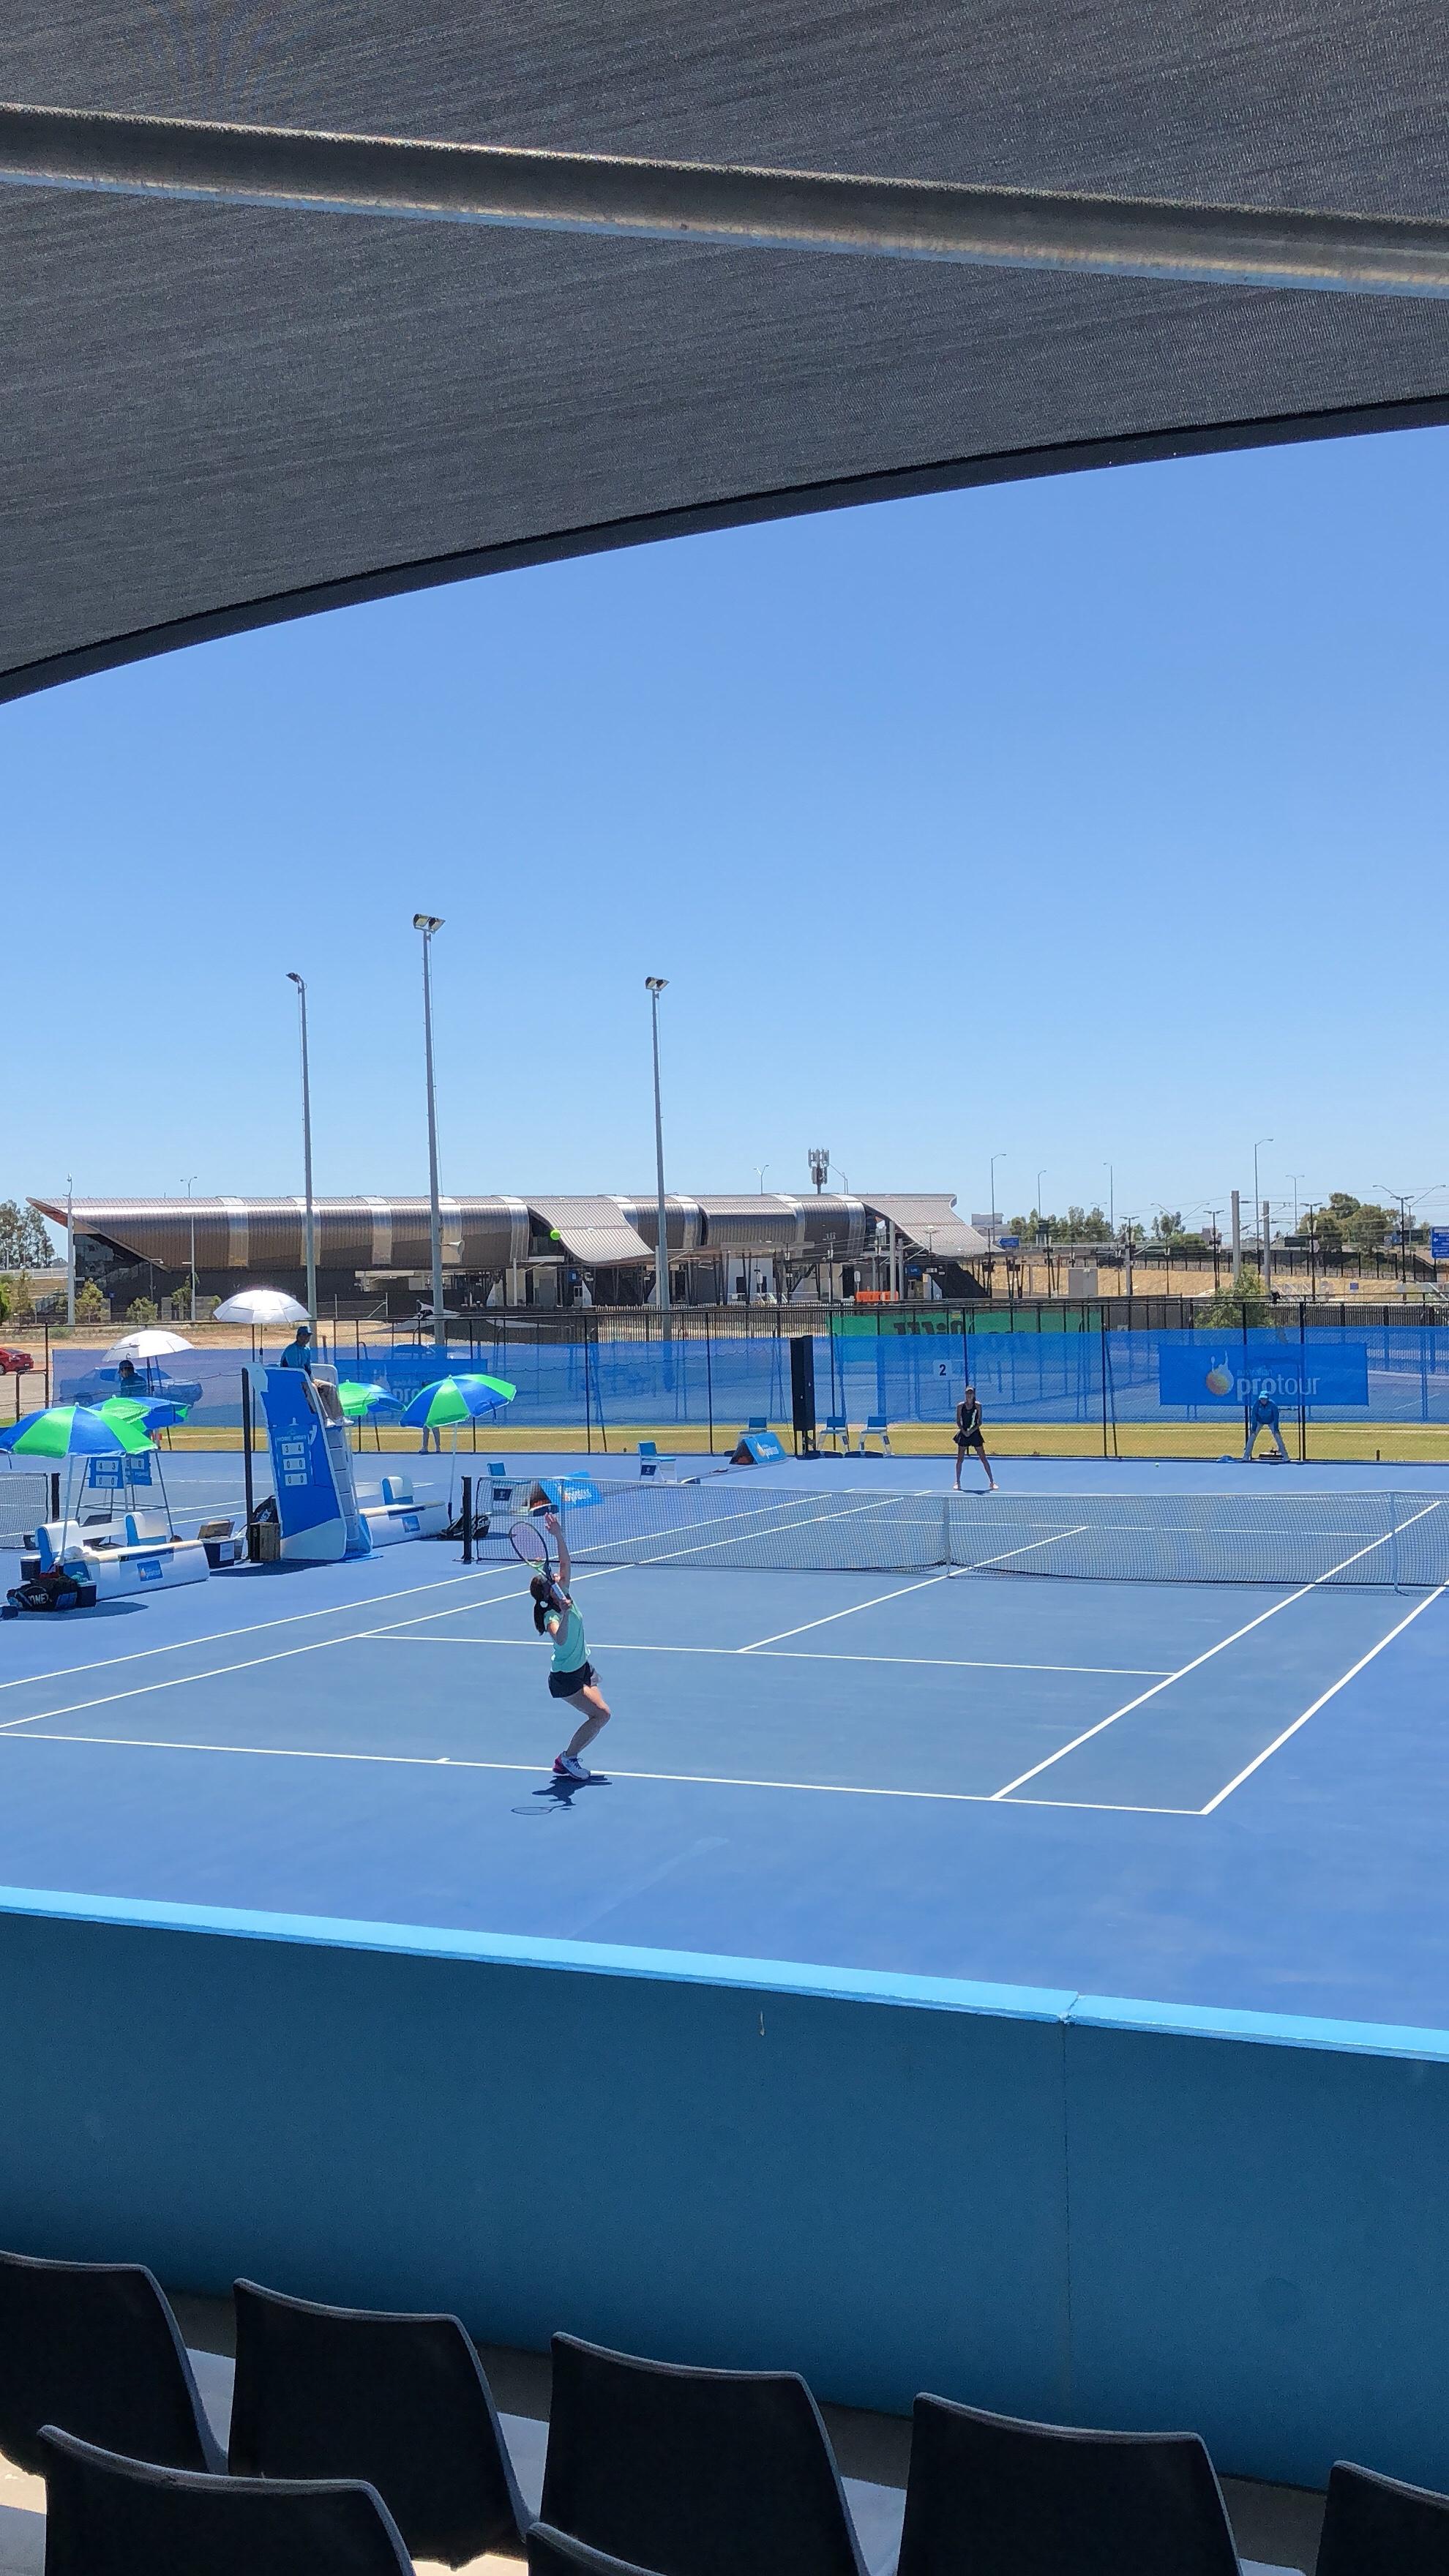 Perth2【プロテニスプレイヤー井上雅オフィシャルブログ -miyabiemみやびーむ-】